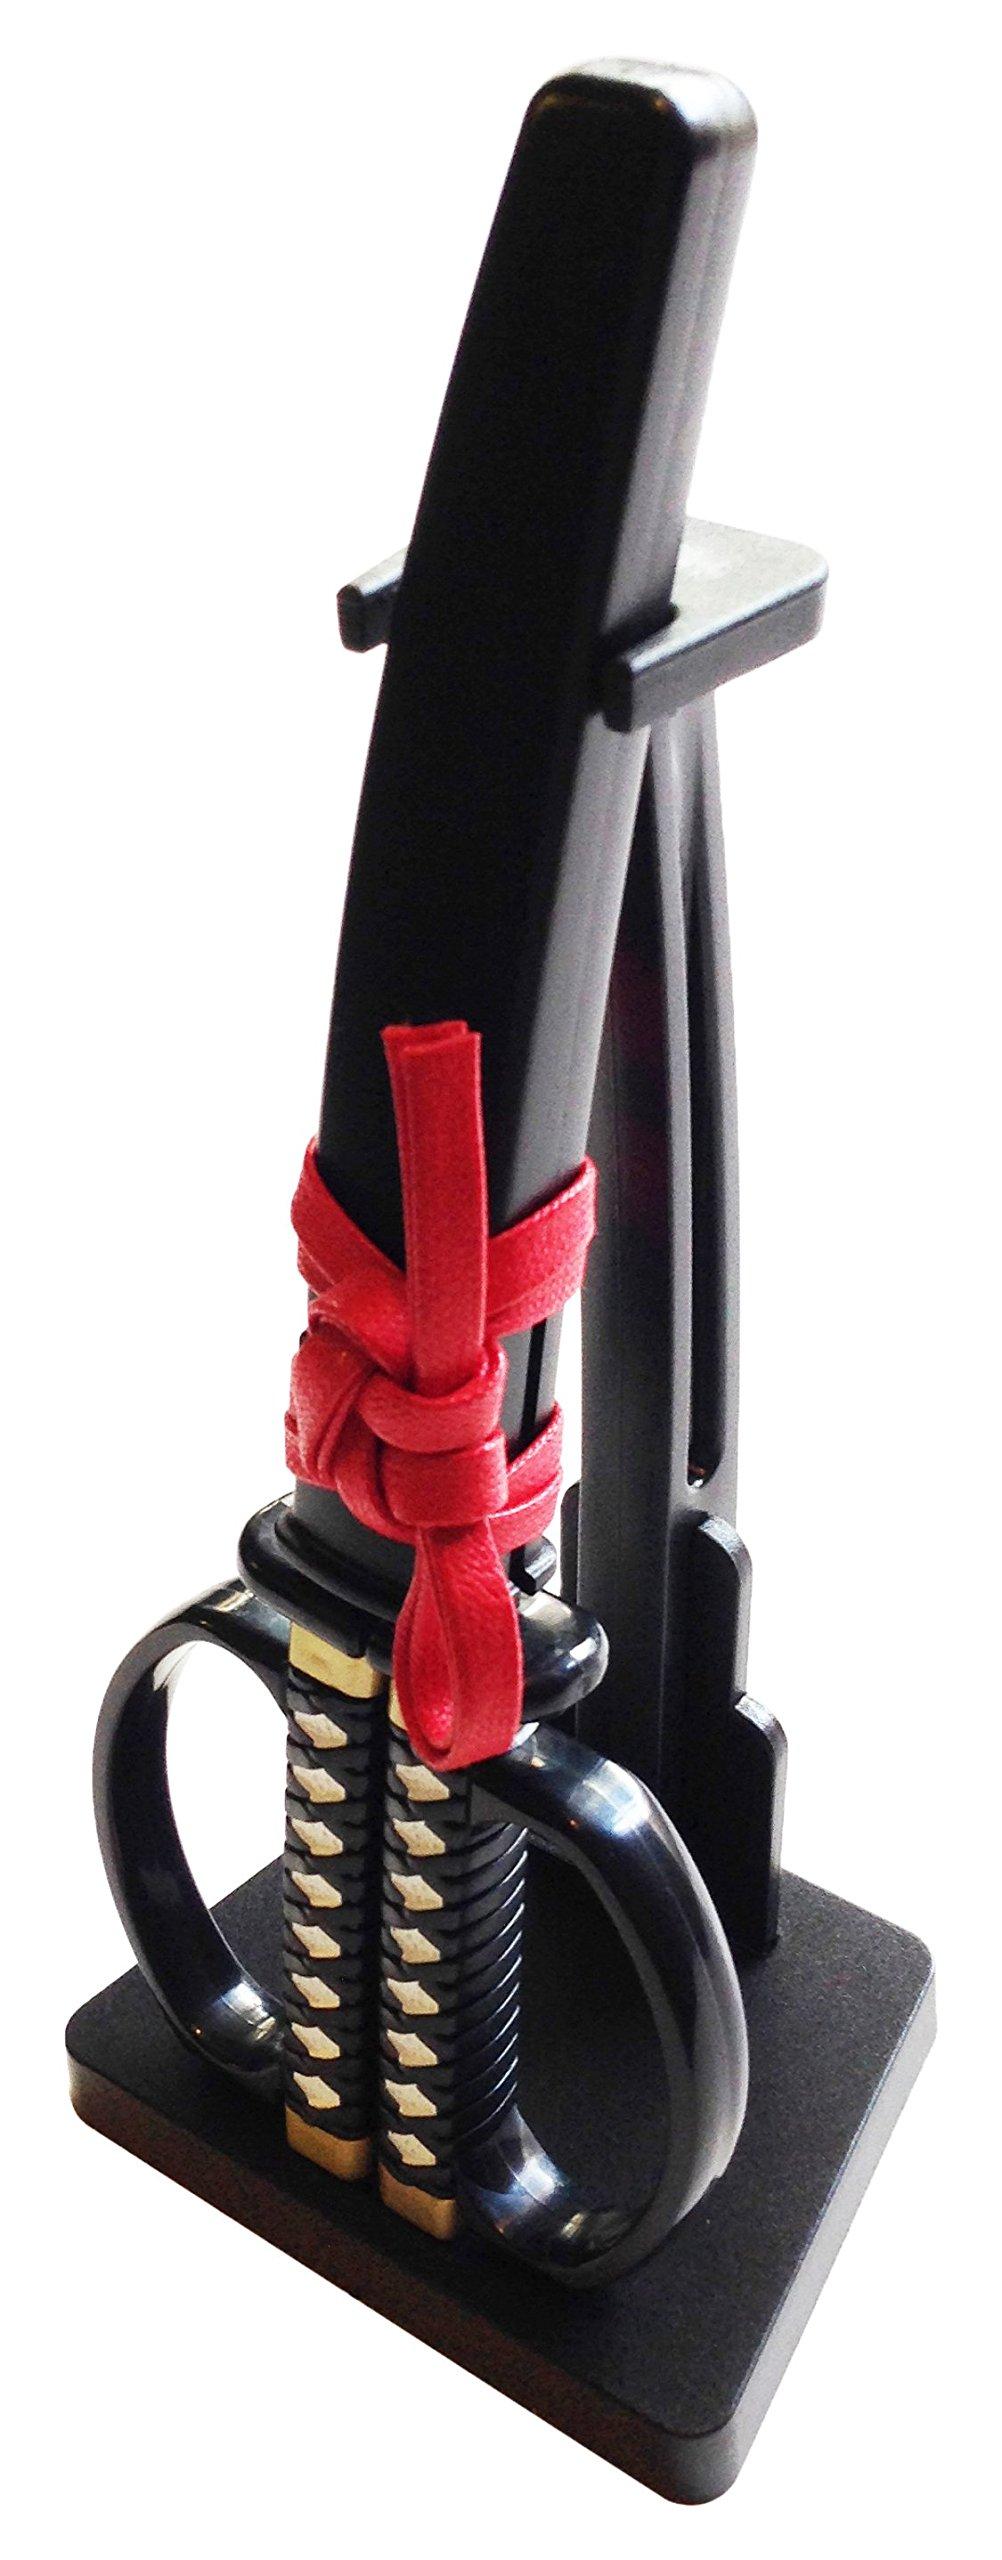 Hanada Home 77-1051 Samurai Sword Scissors with Stand & Case